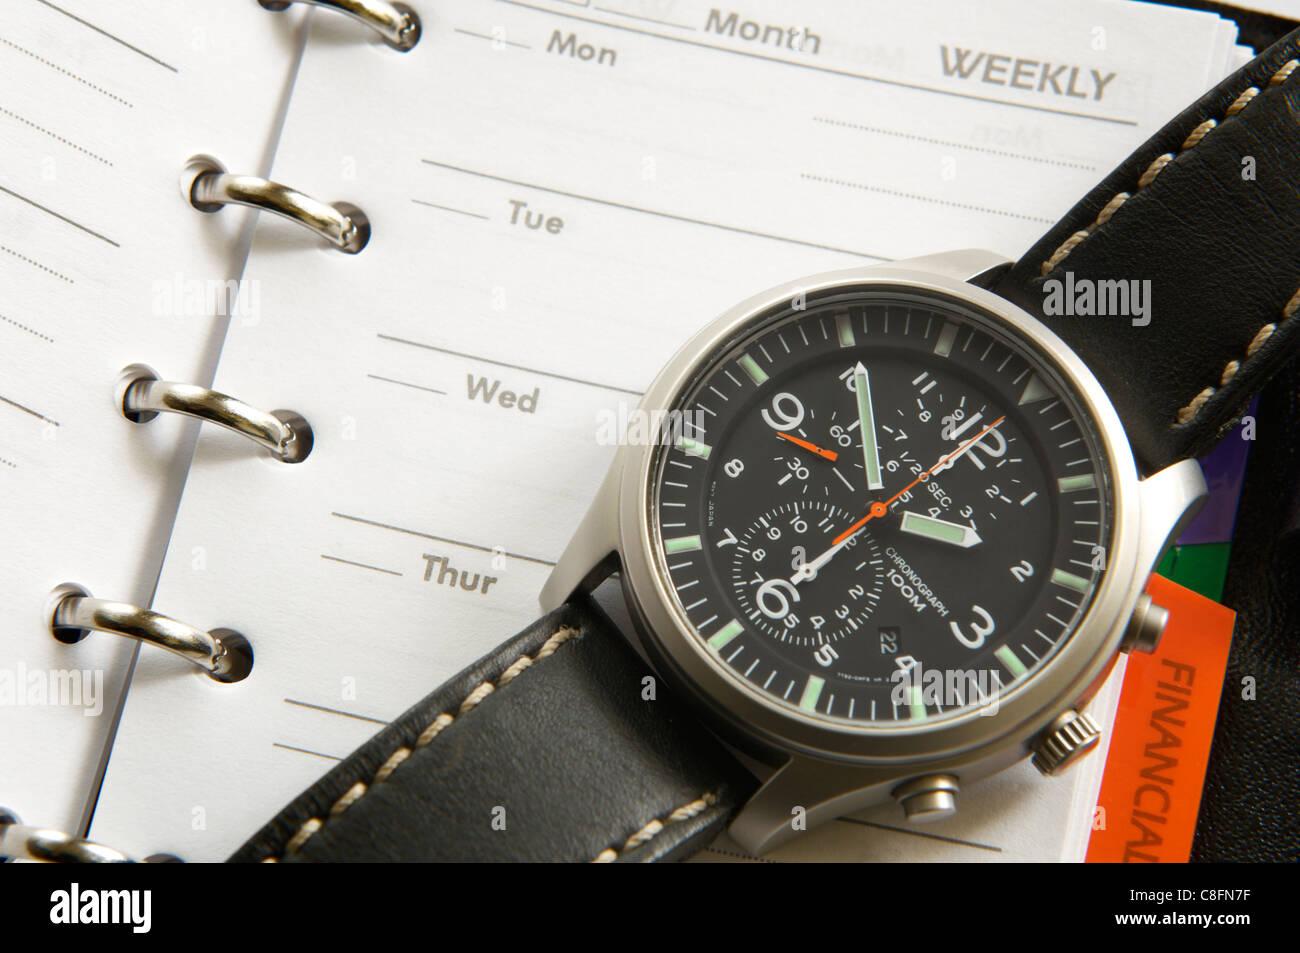 Macro photograph of an organizer and wrist watch - Stock Image